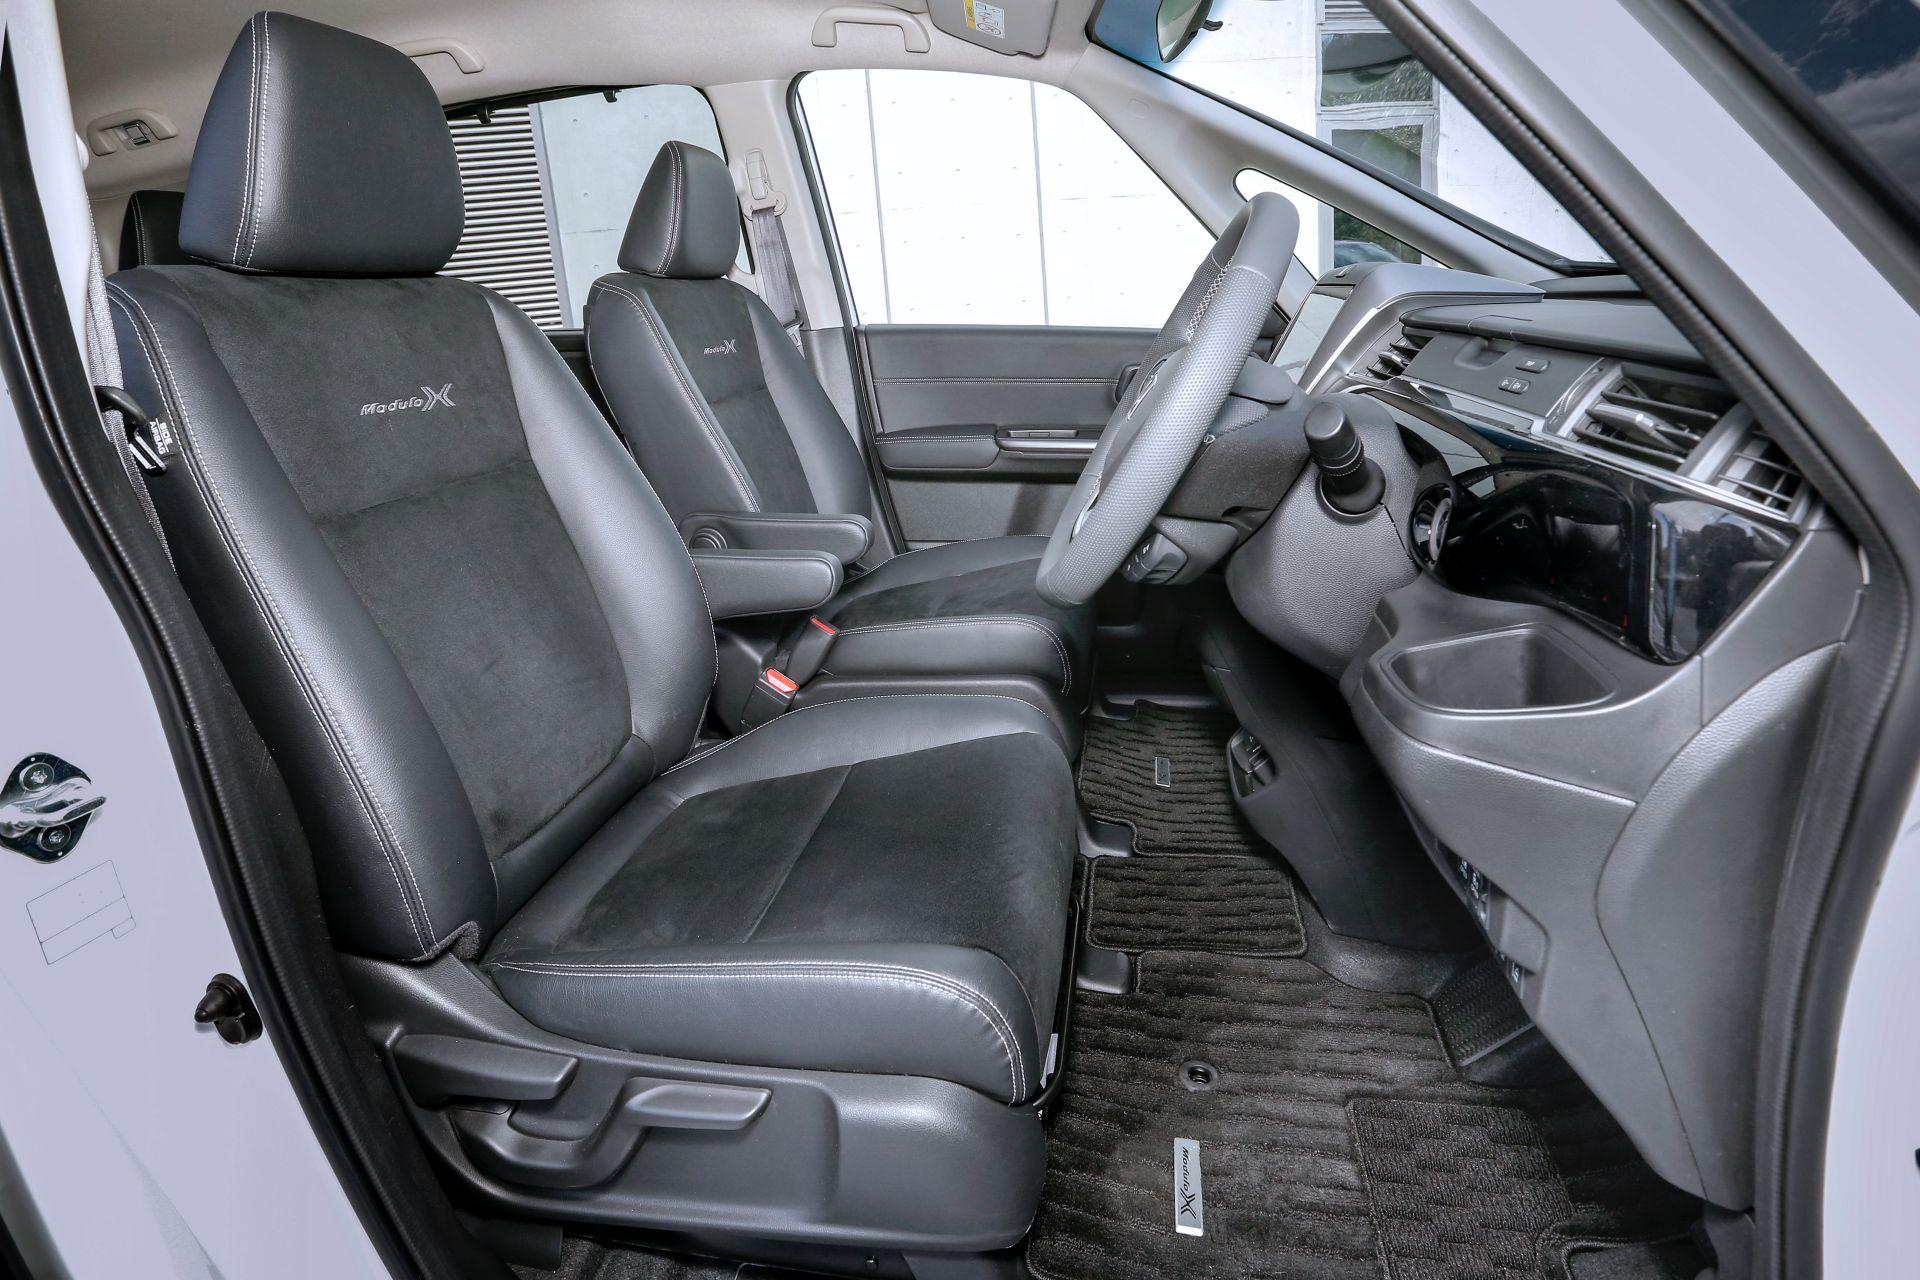 Honda-Freed-Modulo-X-Facelift-2020-16